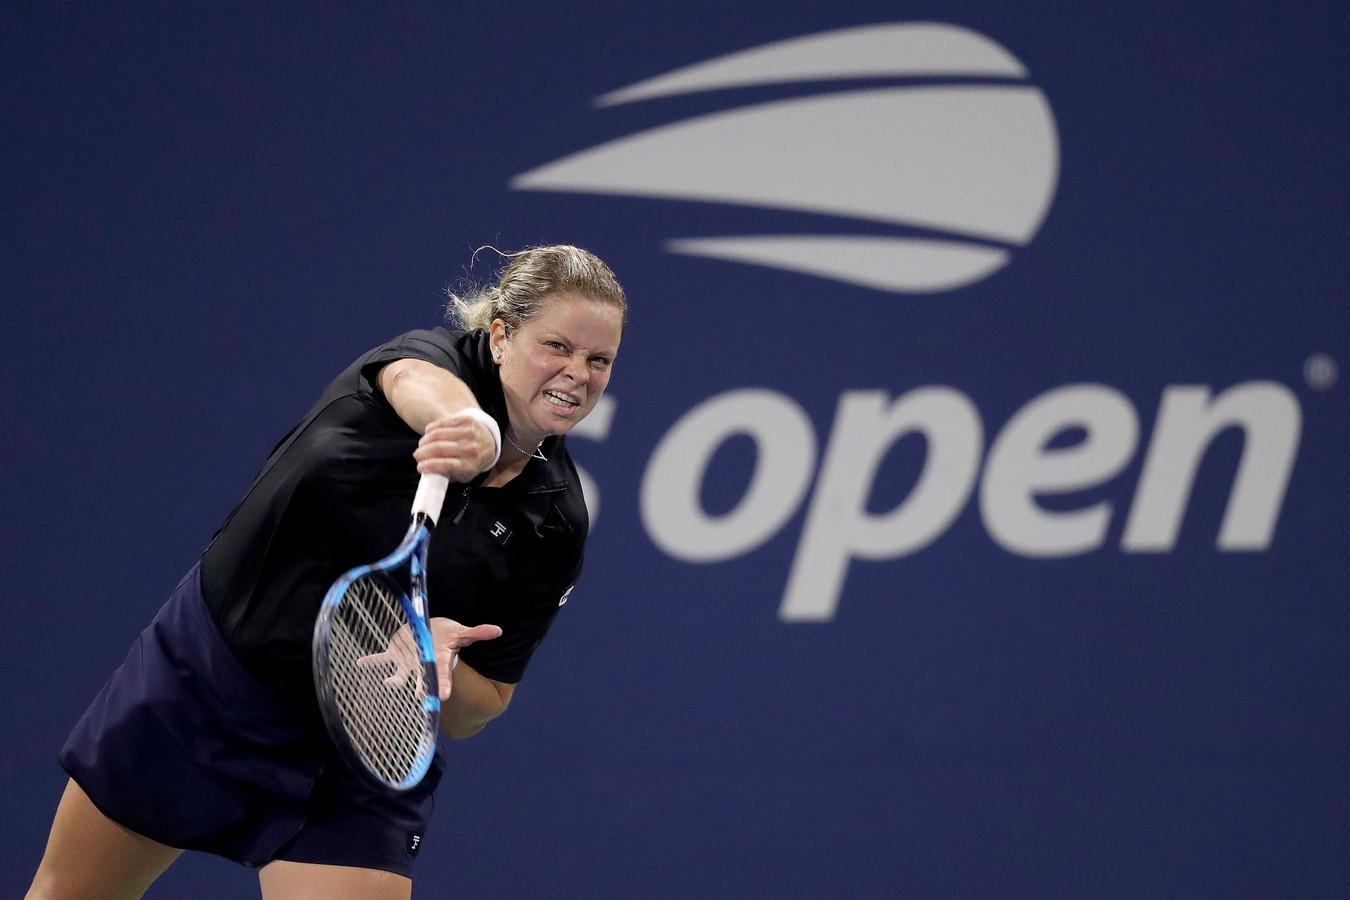 Kim Clijsters à l'US Open en september 2020.